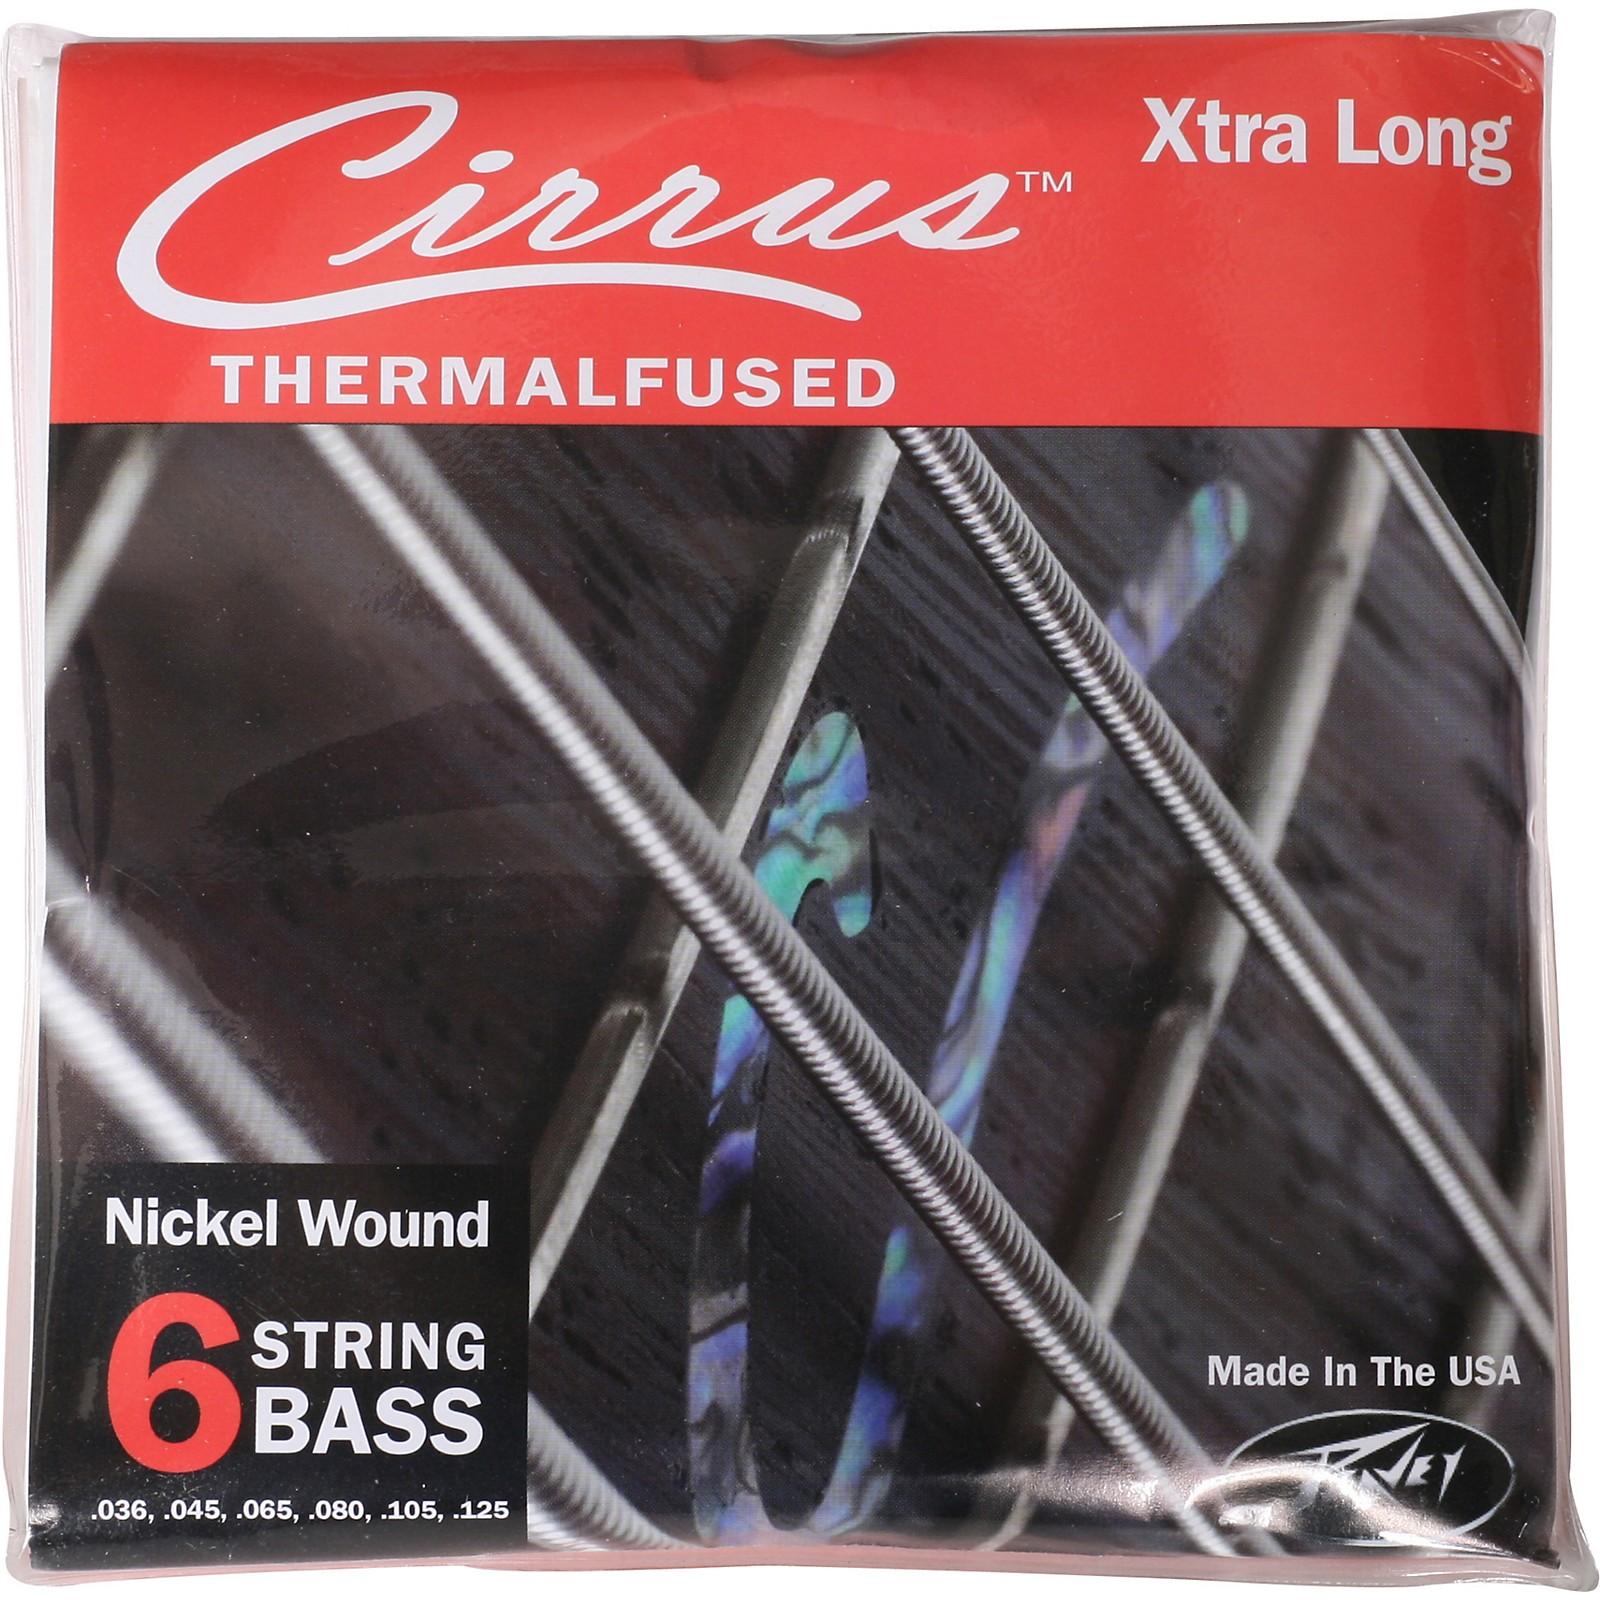 Peavey Peavey Cirrus Nickel-Wound Electric Bass Strings 6XL